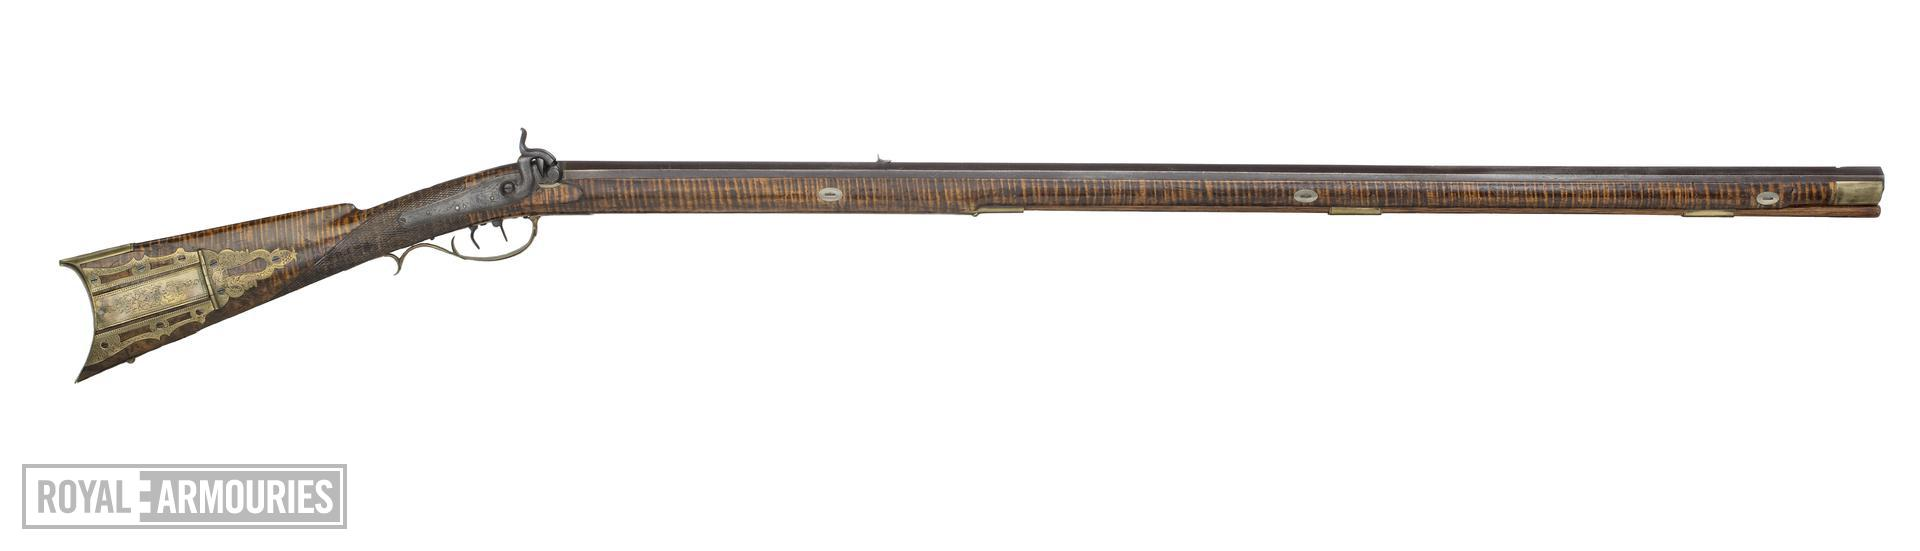 Percussion muzzle-loading target rifle - Kentucky Rifle By H.E. Leman